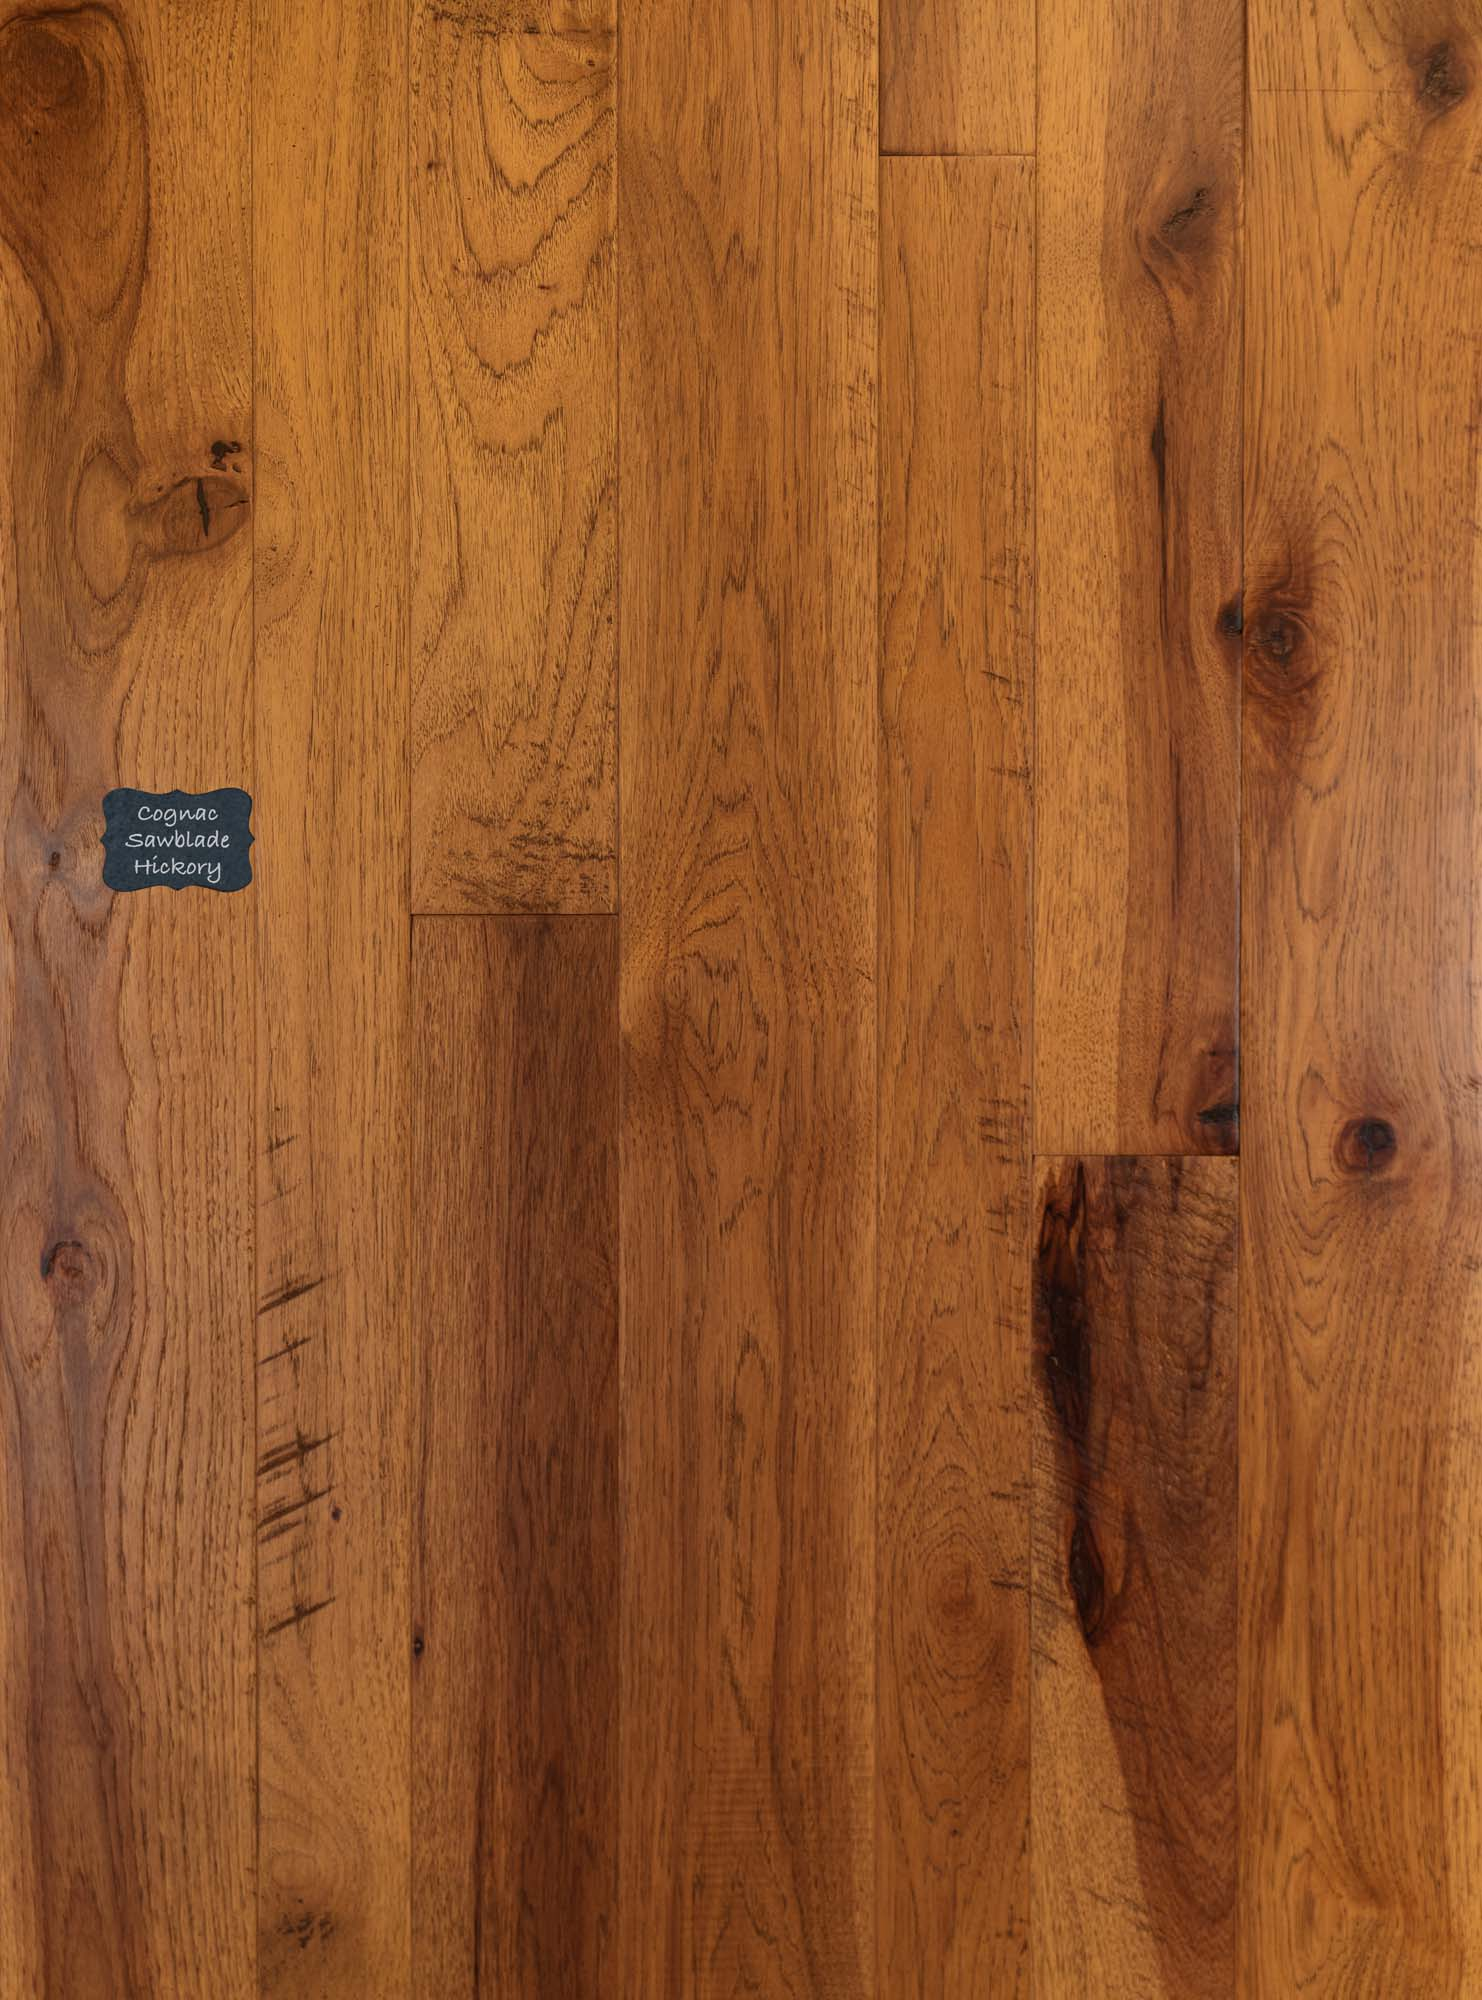 Cognac Sawblade Hickory Wood Flooring.